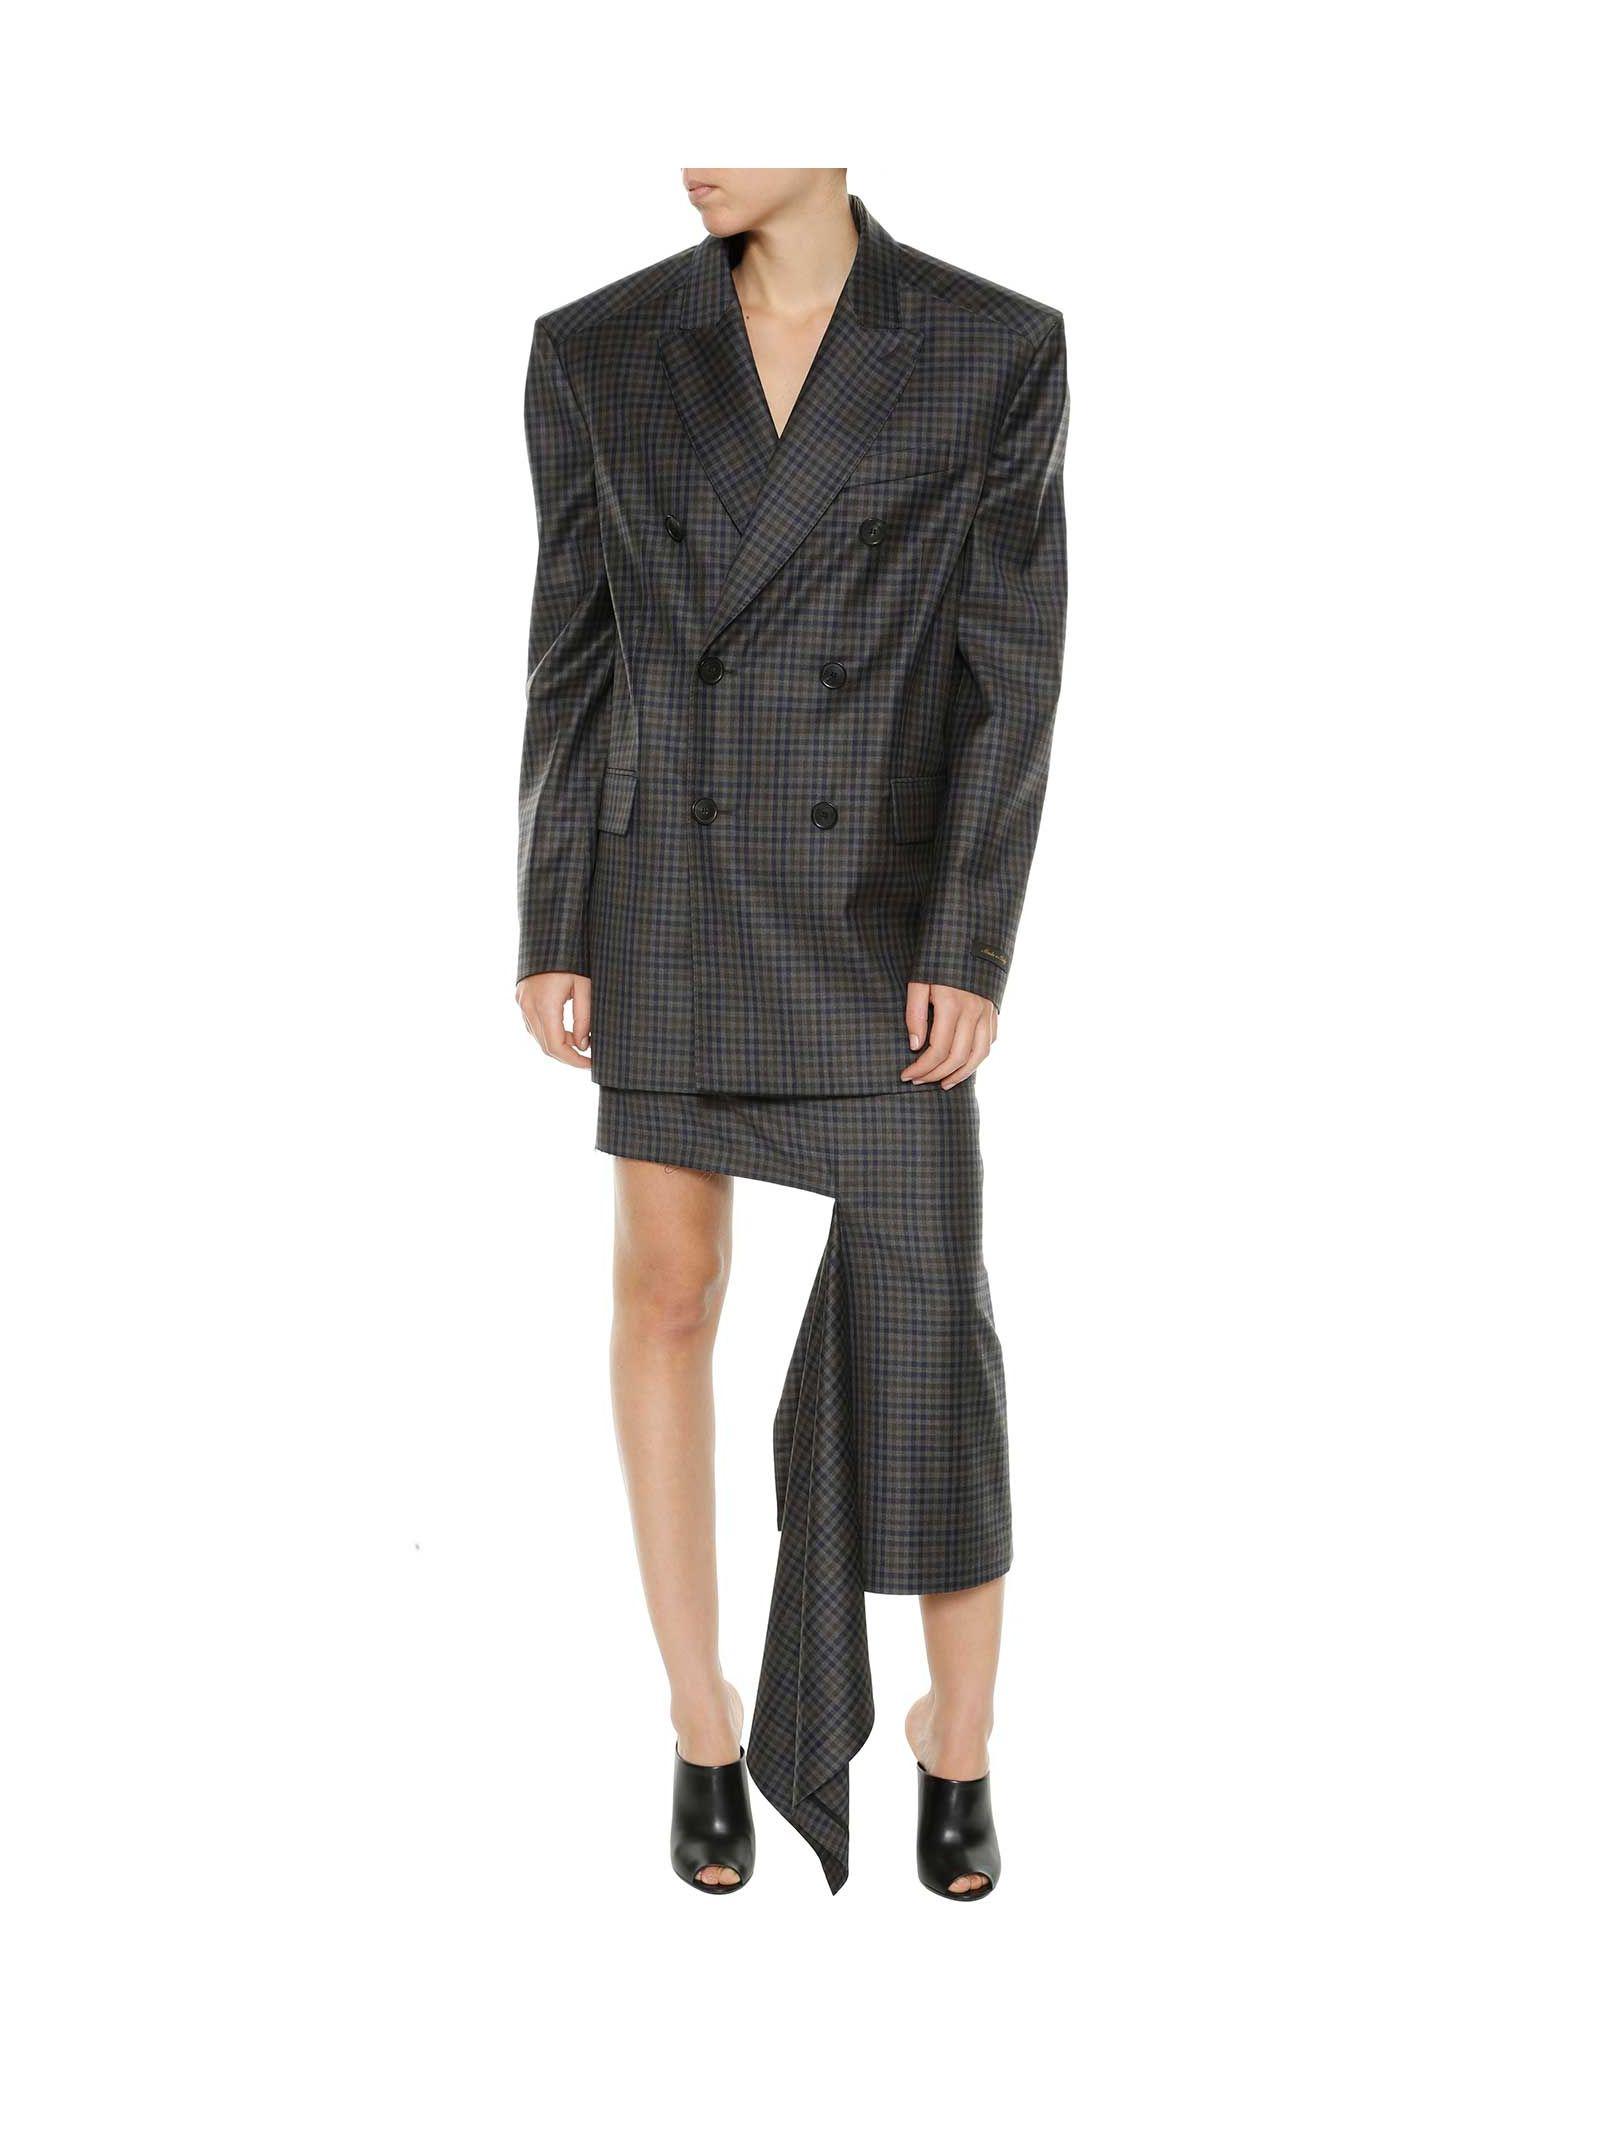 Balenciaga Ripped Skirt